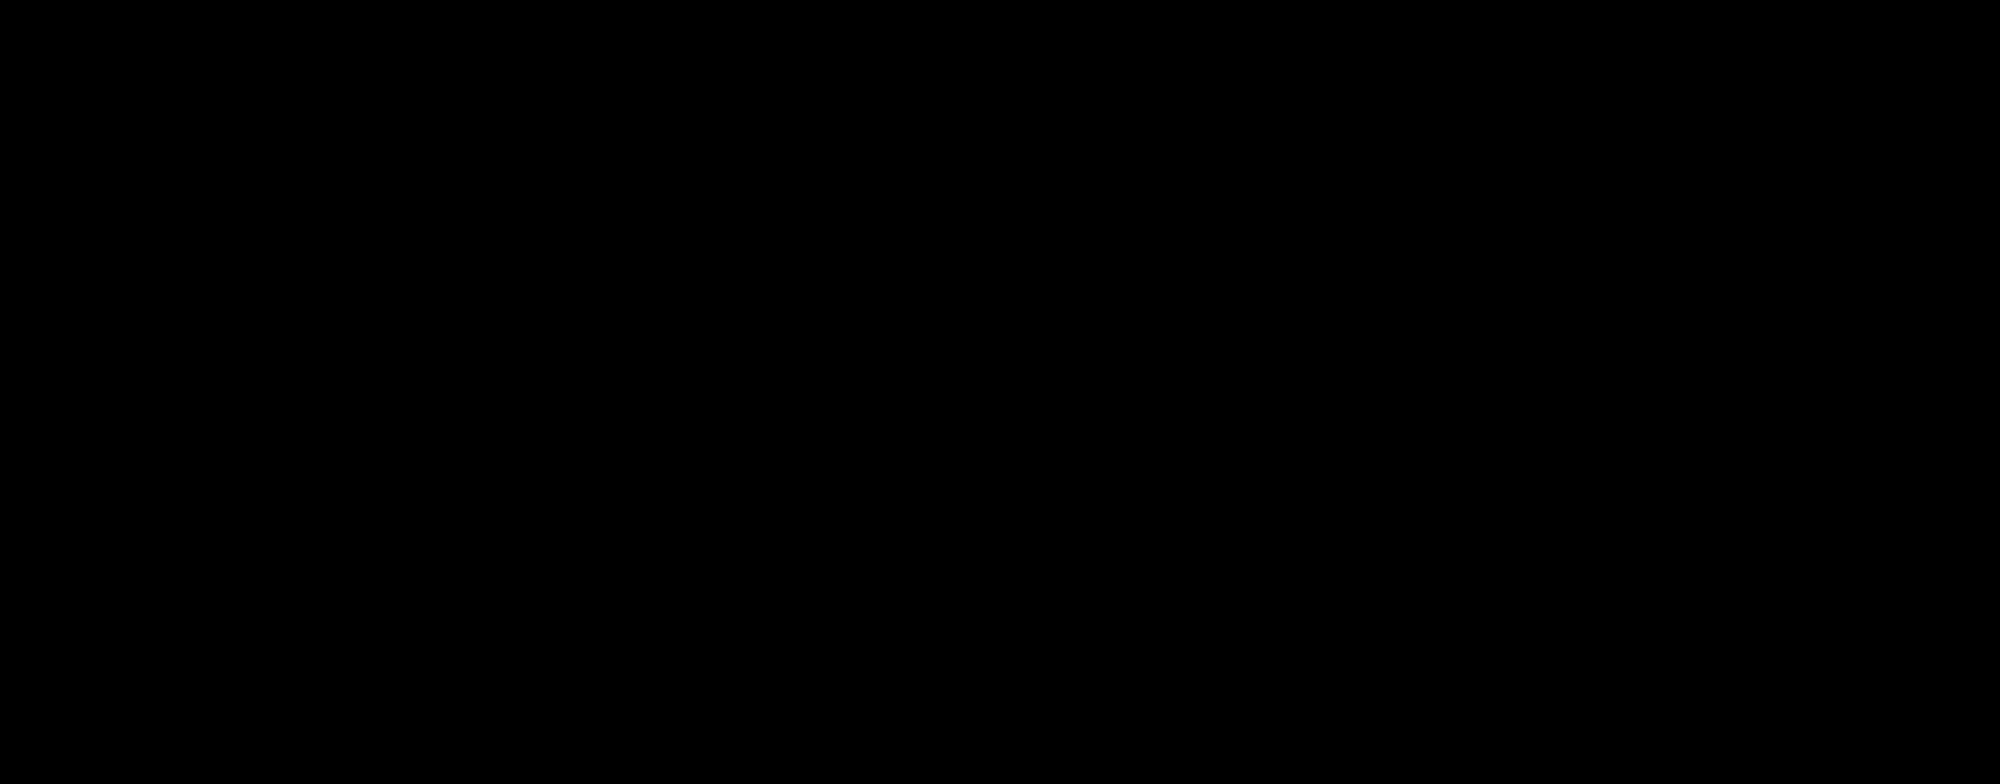 Kempinski Hotel logo